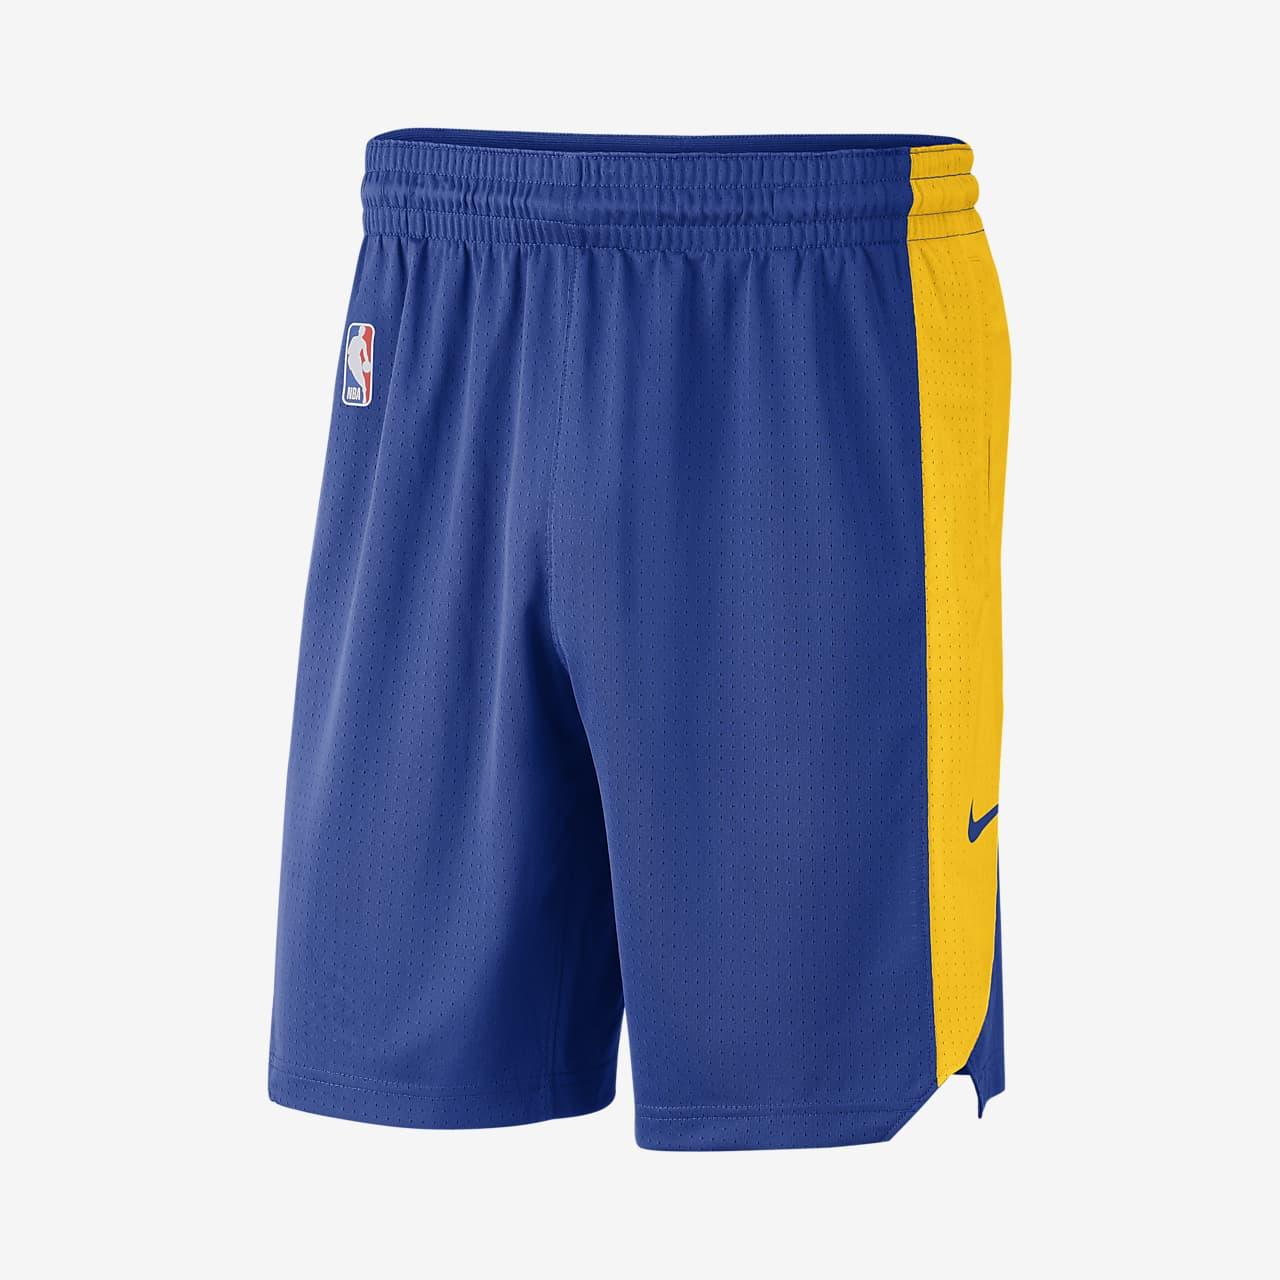 Golden State Warriors Nike Men's NBA Training Shorts